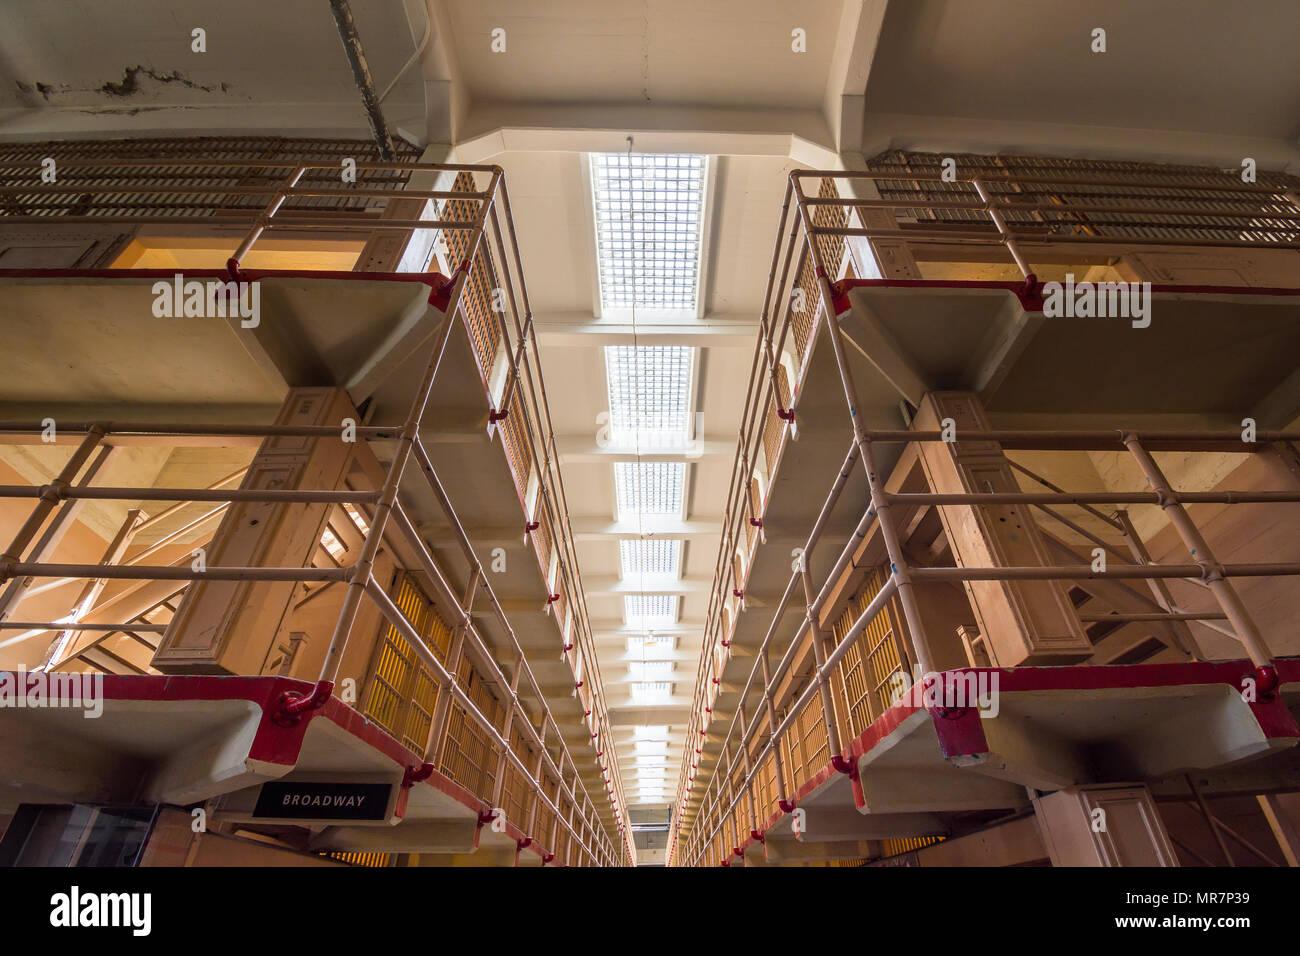 Galleries inside Alcatraz prison, San Francisco, CA, USA. - Stock Image